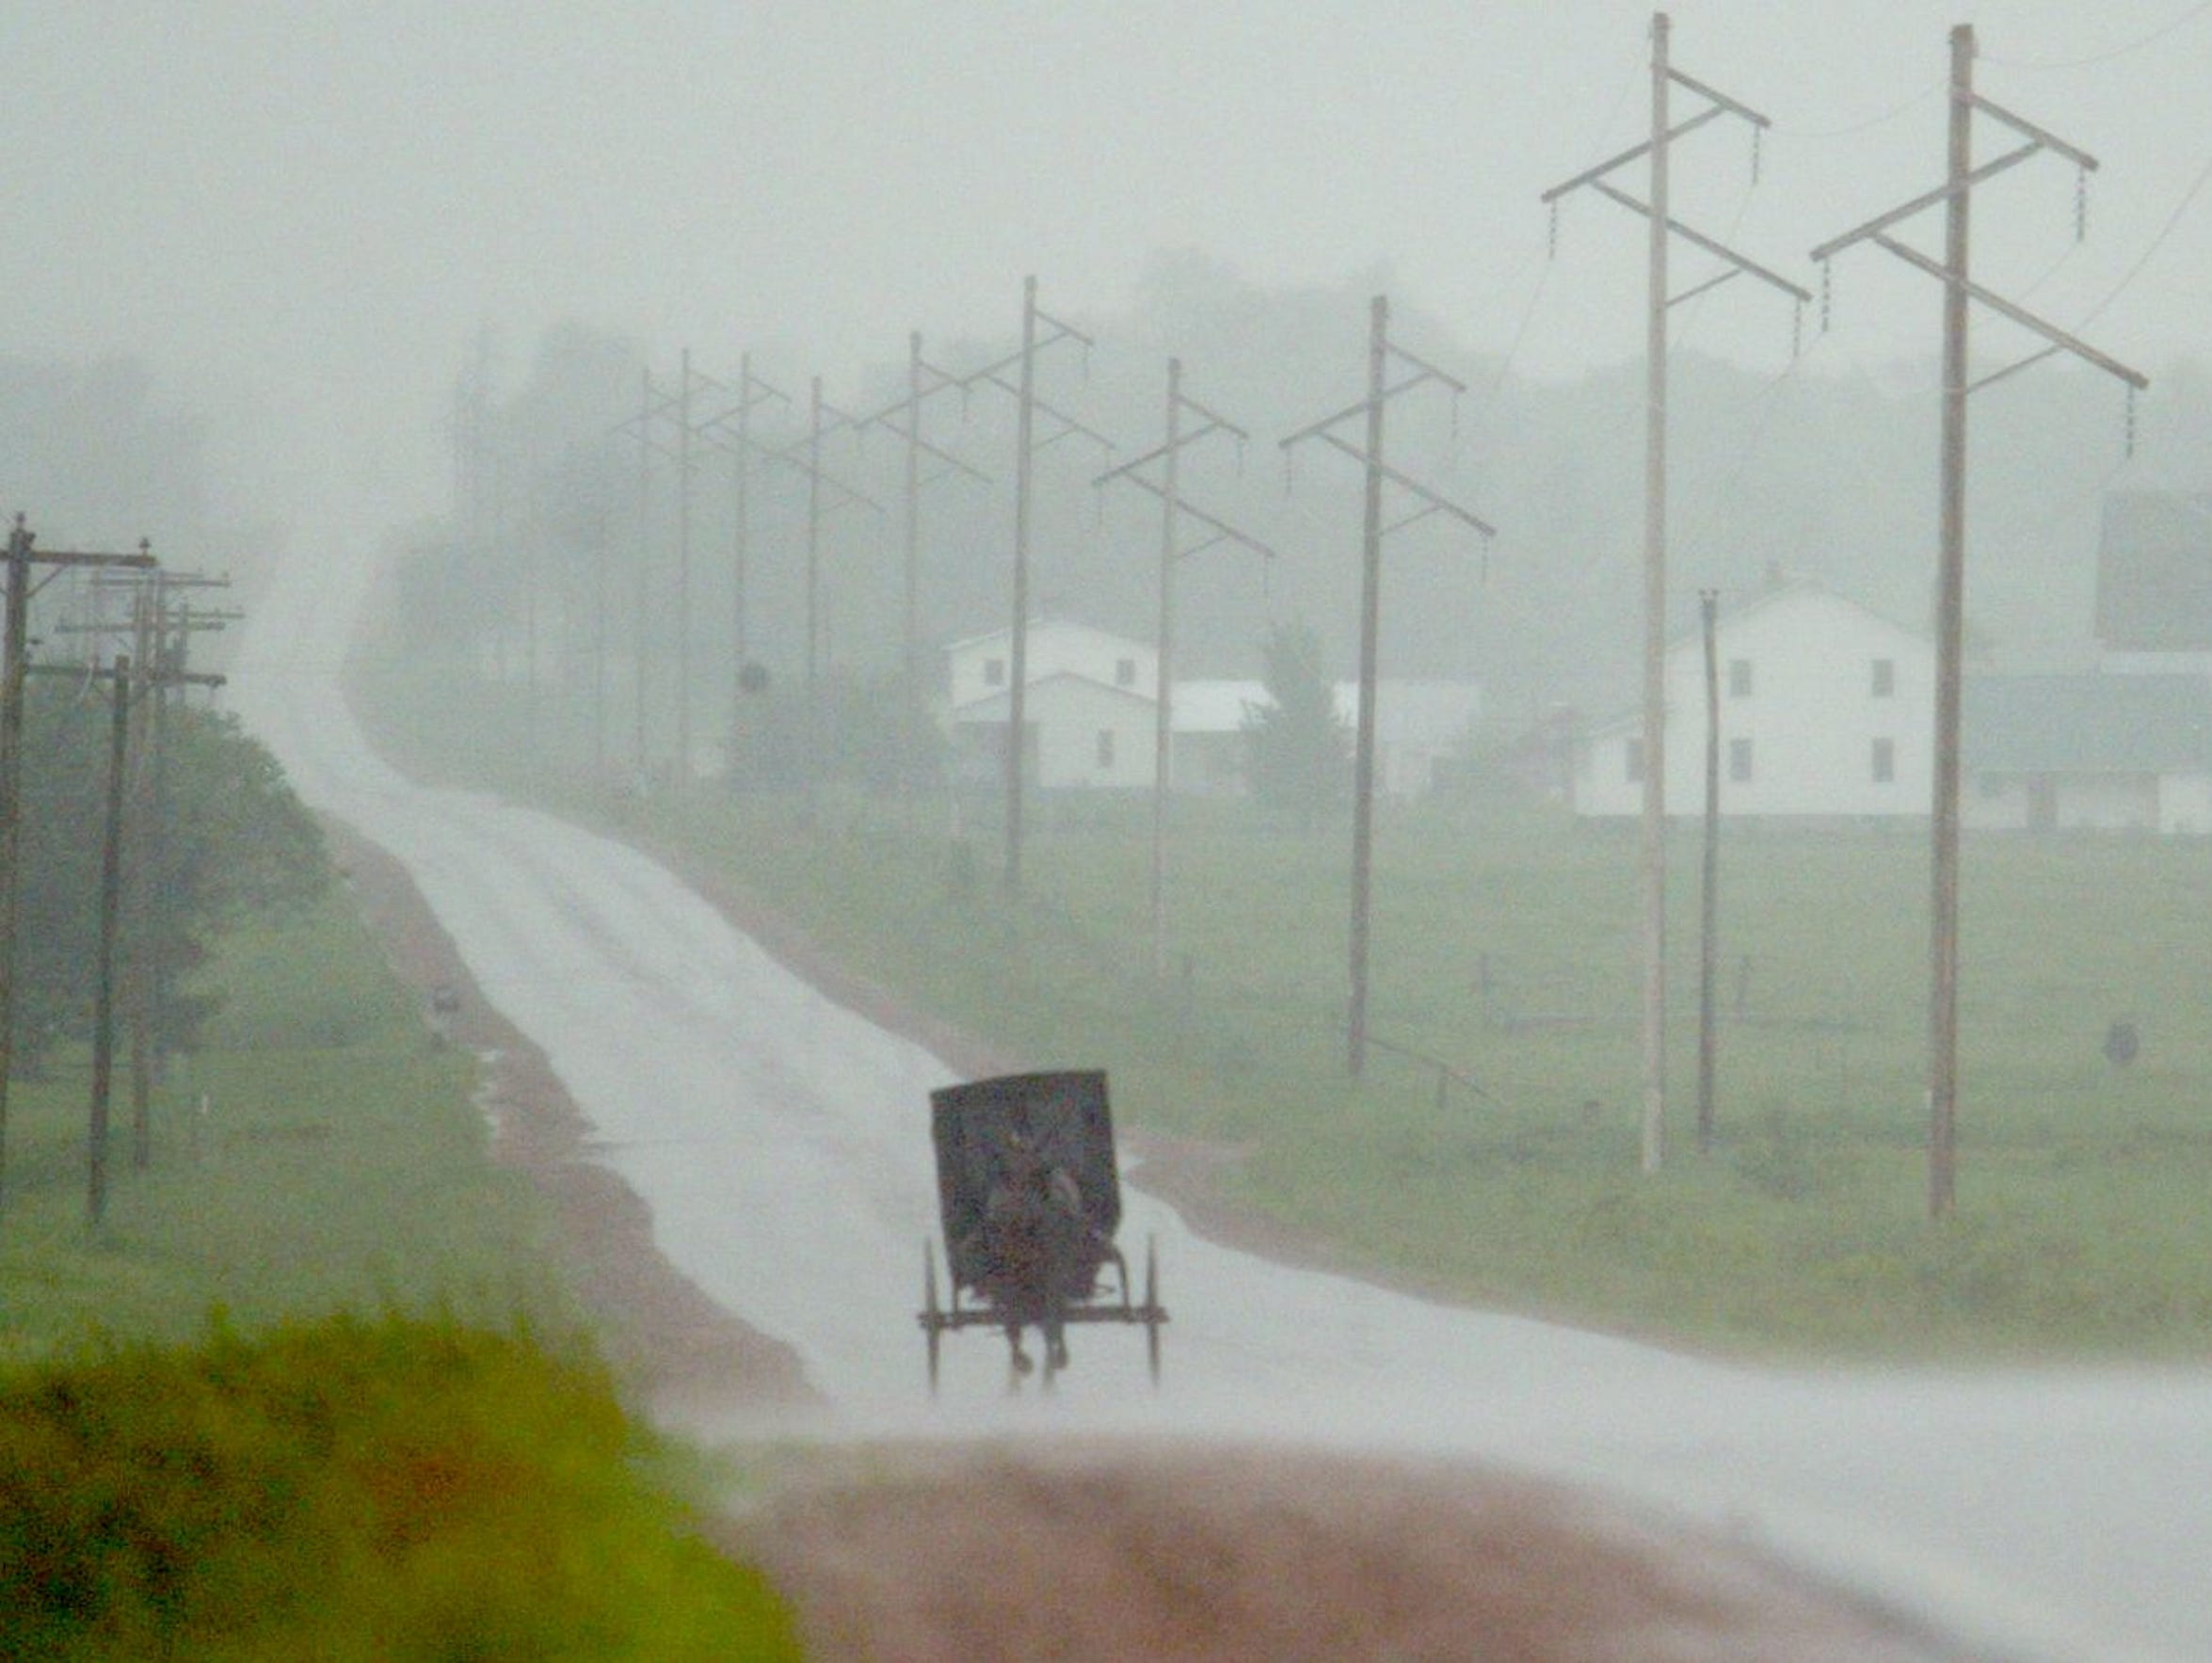 An Amish buggy drives through the rain in Clark County.